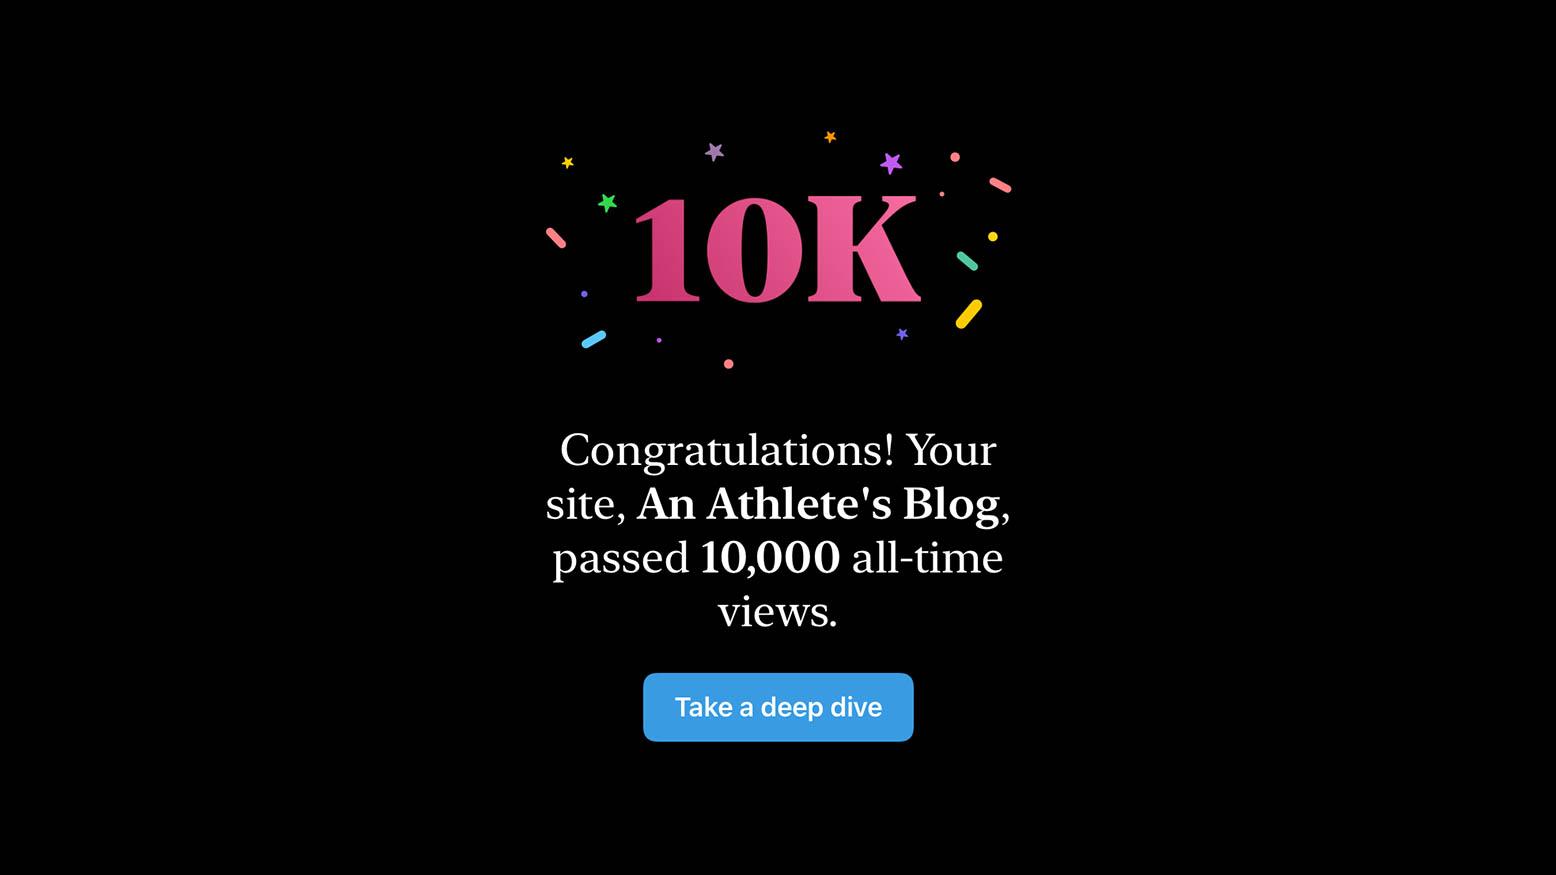 Screenshot of 10k View Congrats